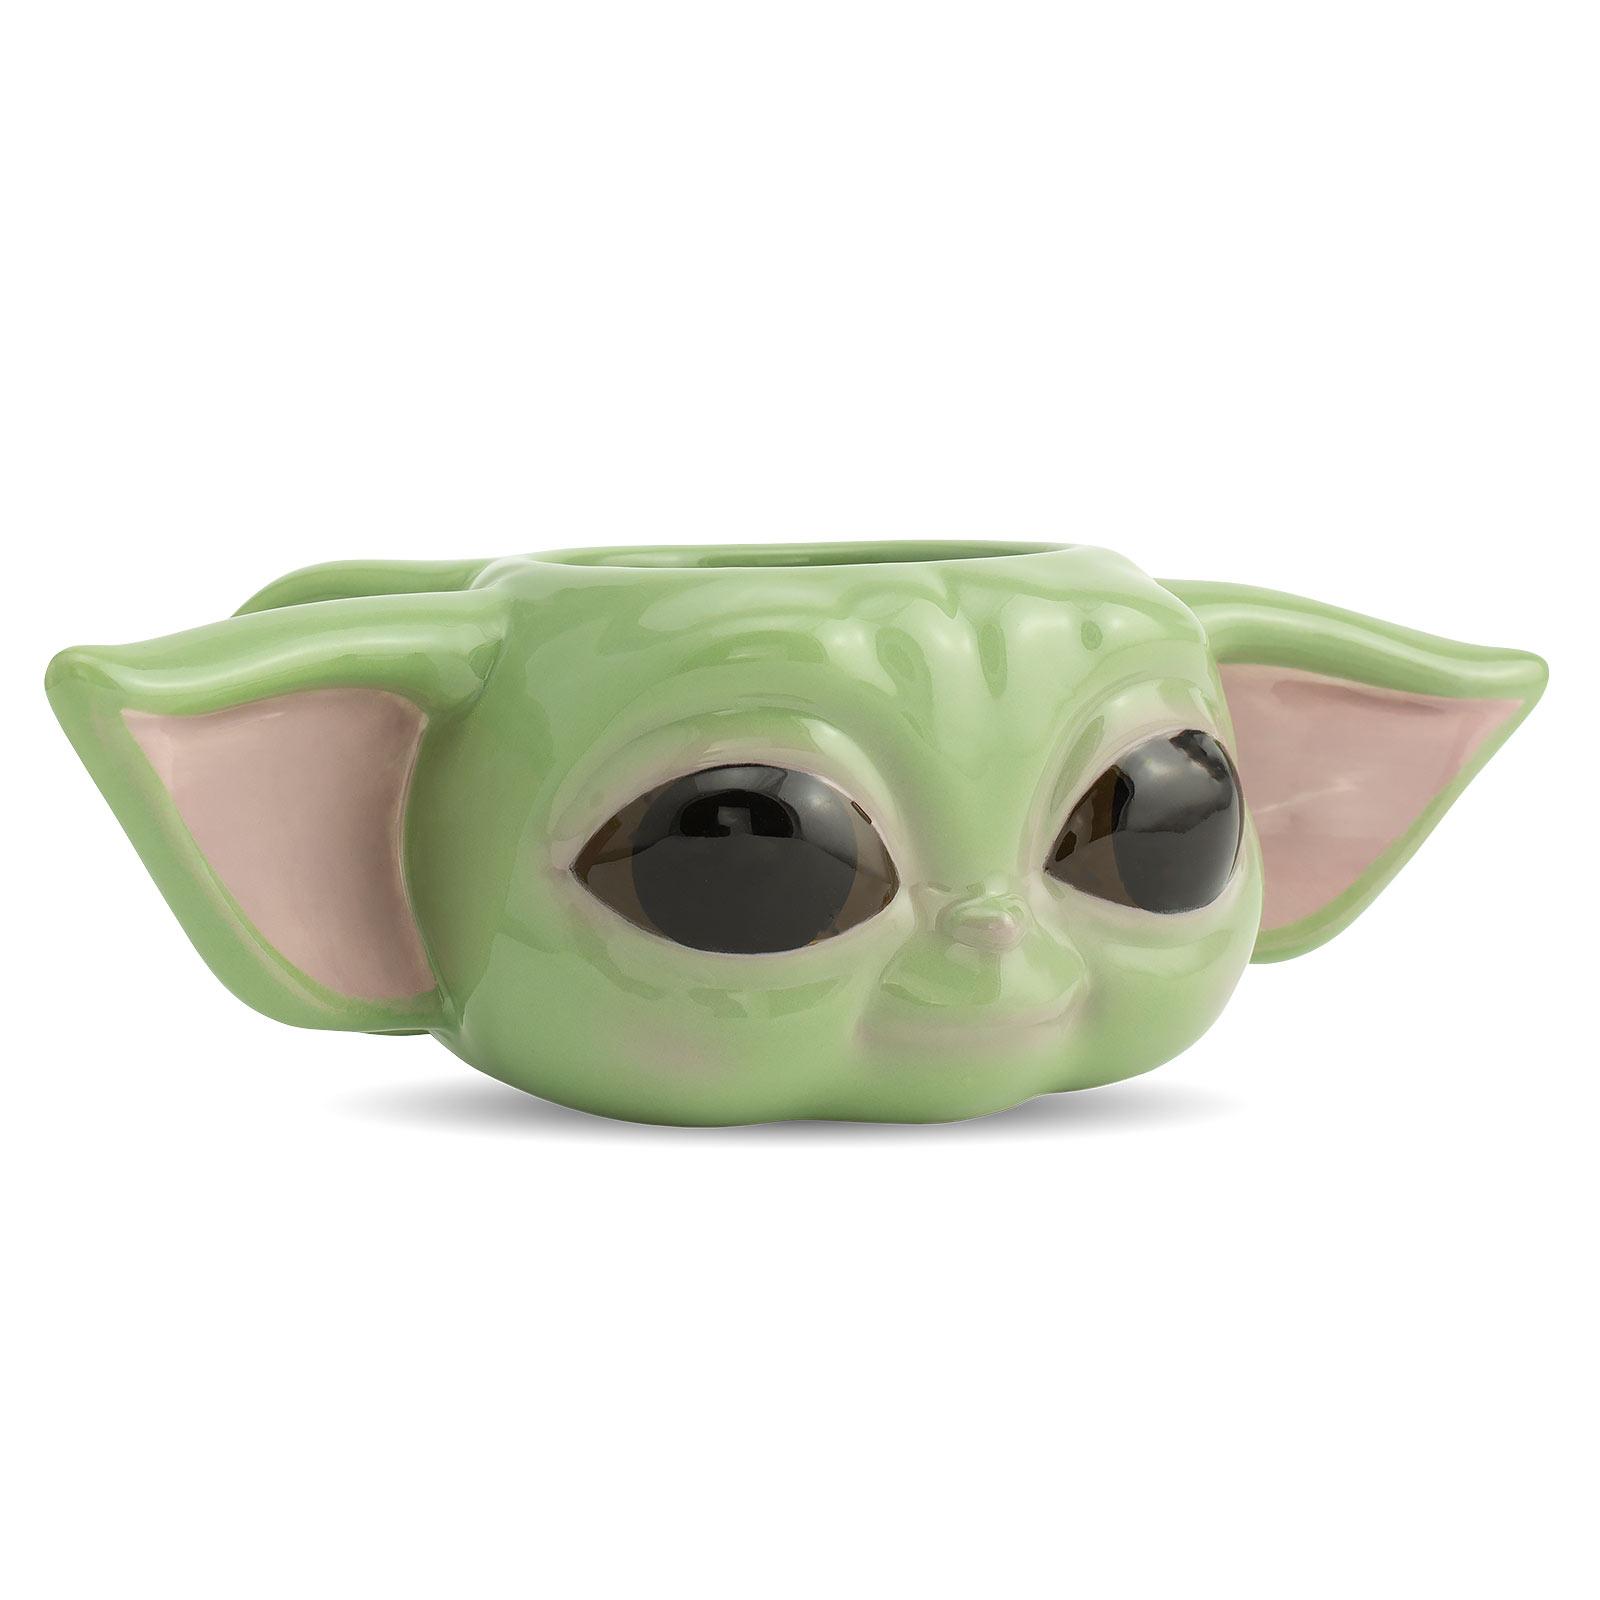 The Child 3D Tasse - Star Wars The Mandalorian